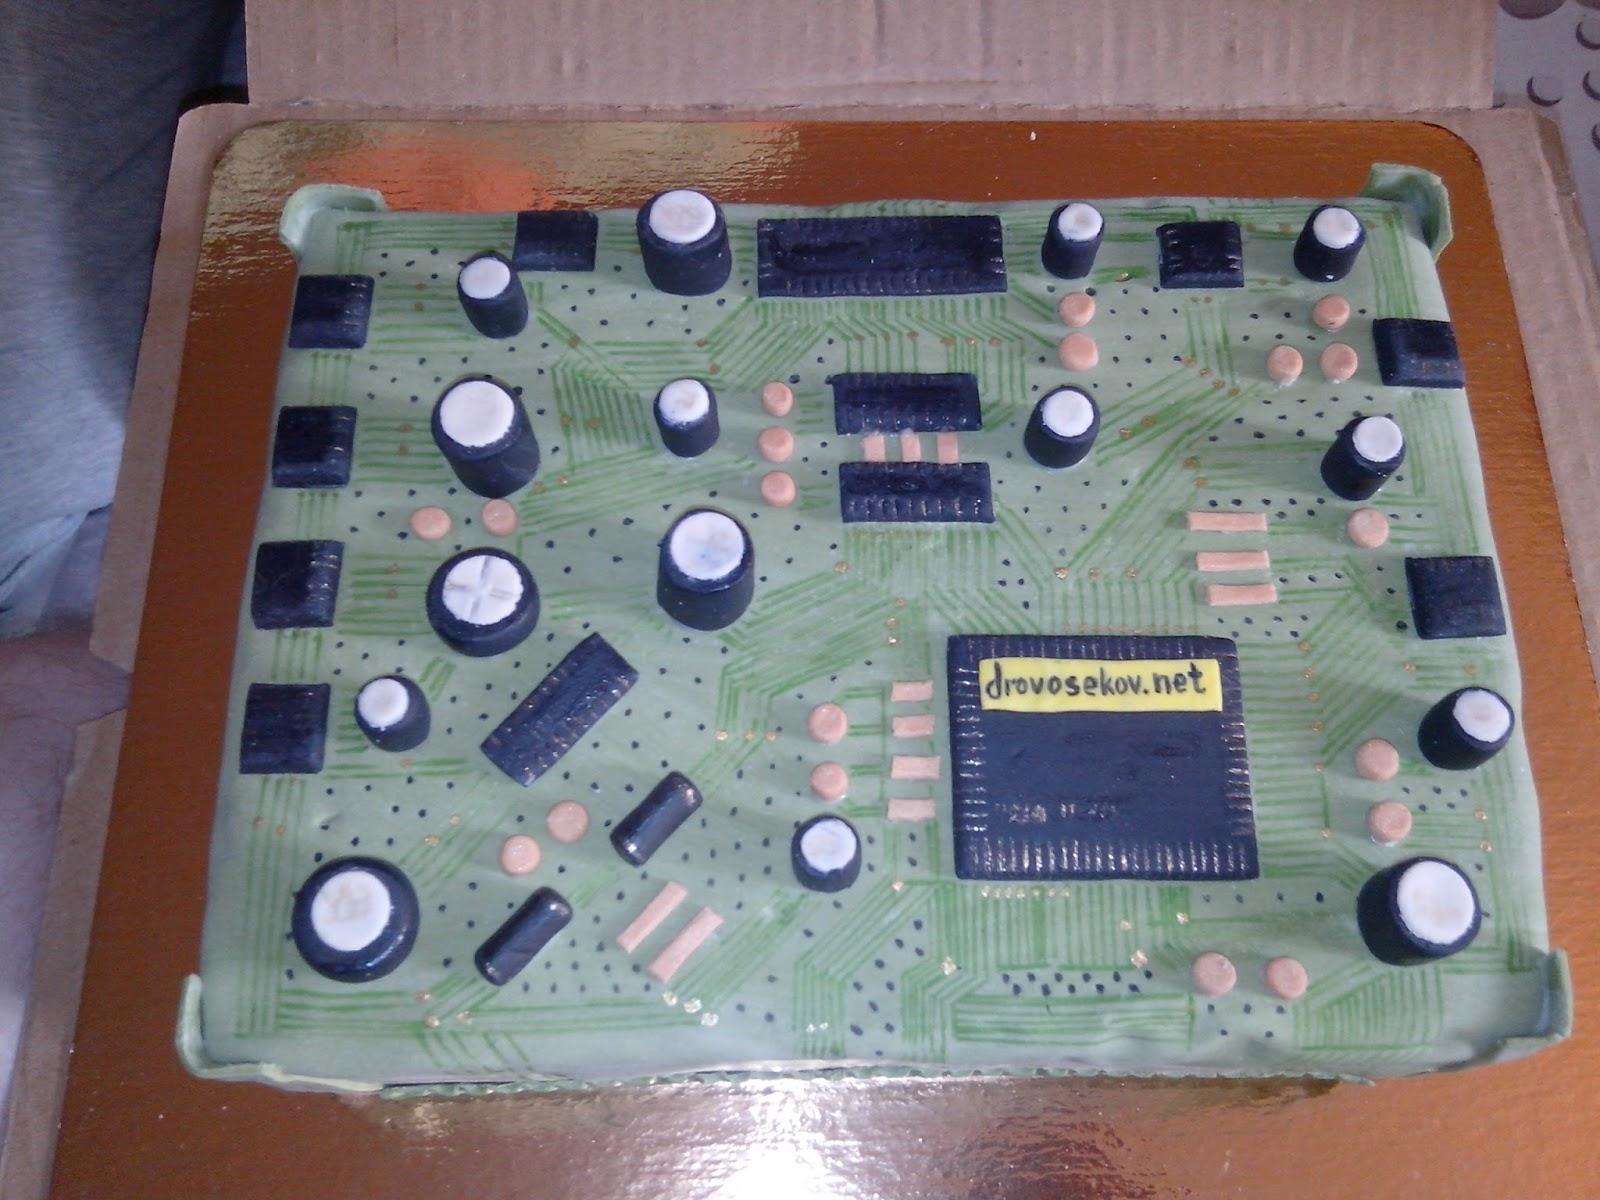 stm32f103c8t6 discovery схема